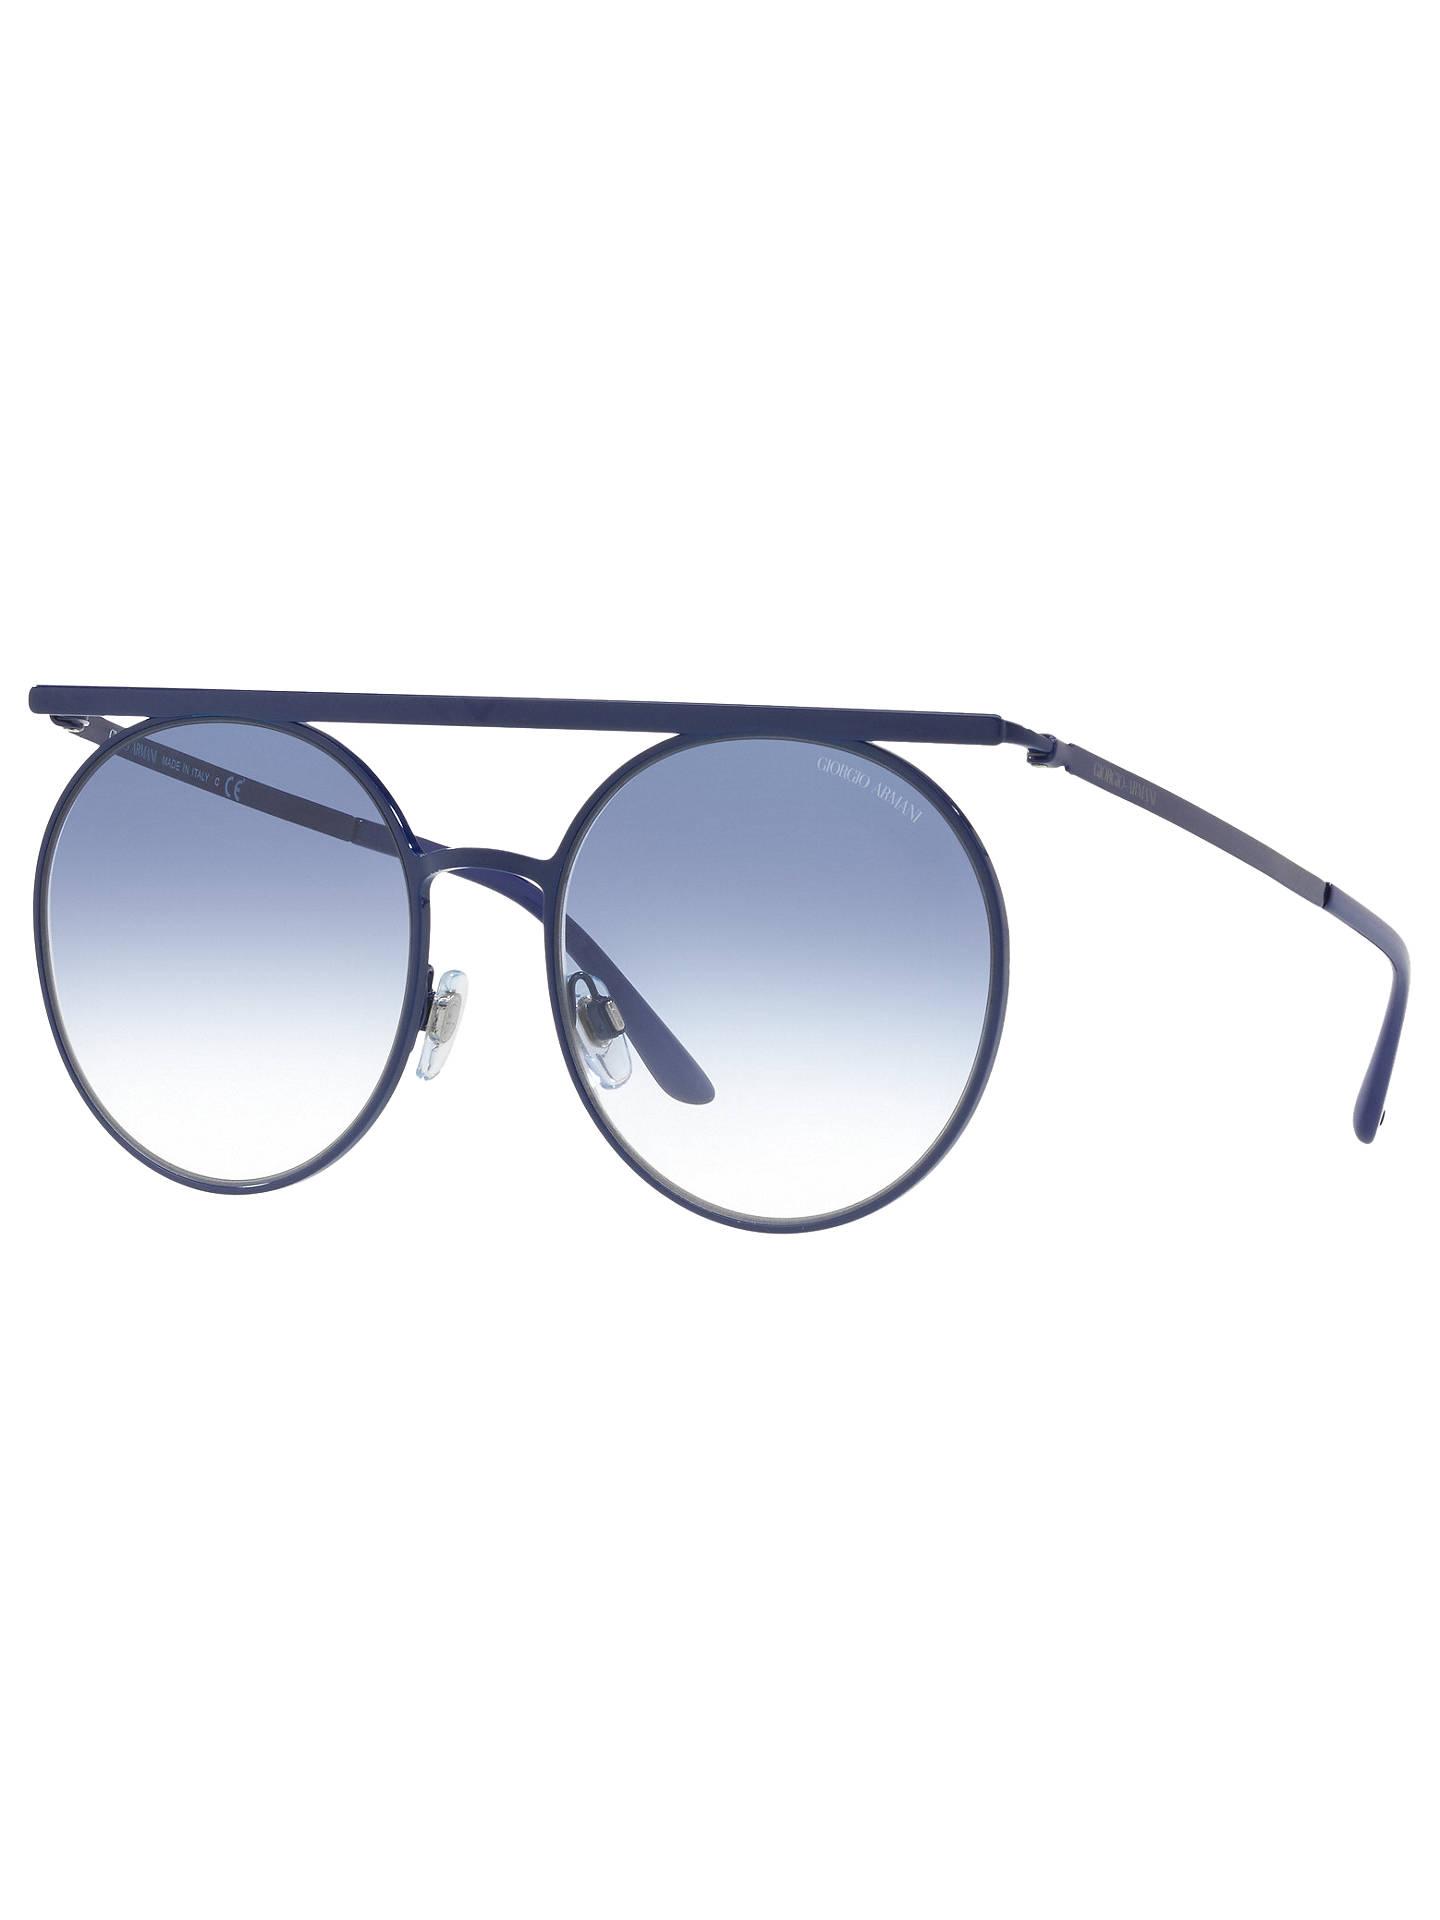 30154be08709 Buy Giorgio Armani AR6069 Round Sunglasses